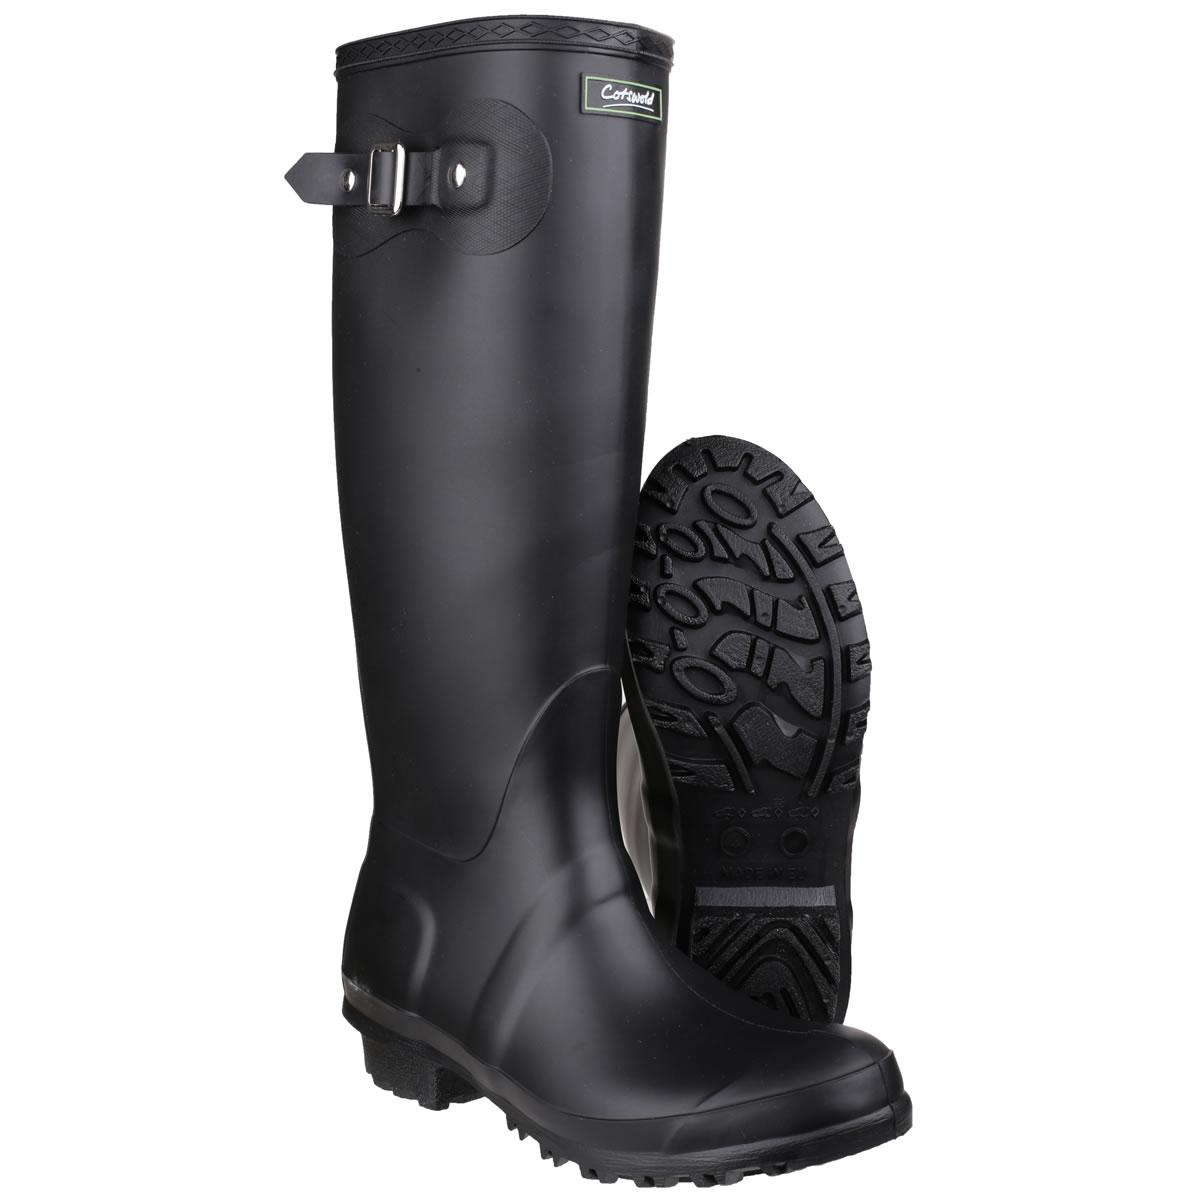 1df42bf7f8e Womens Cotswold Sandringham Wellington Boots - Black - UK Size 7